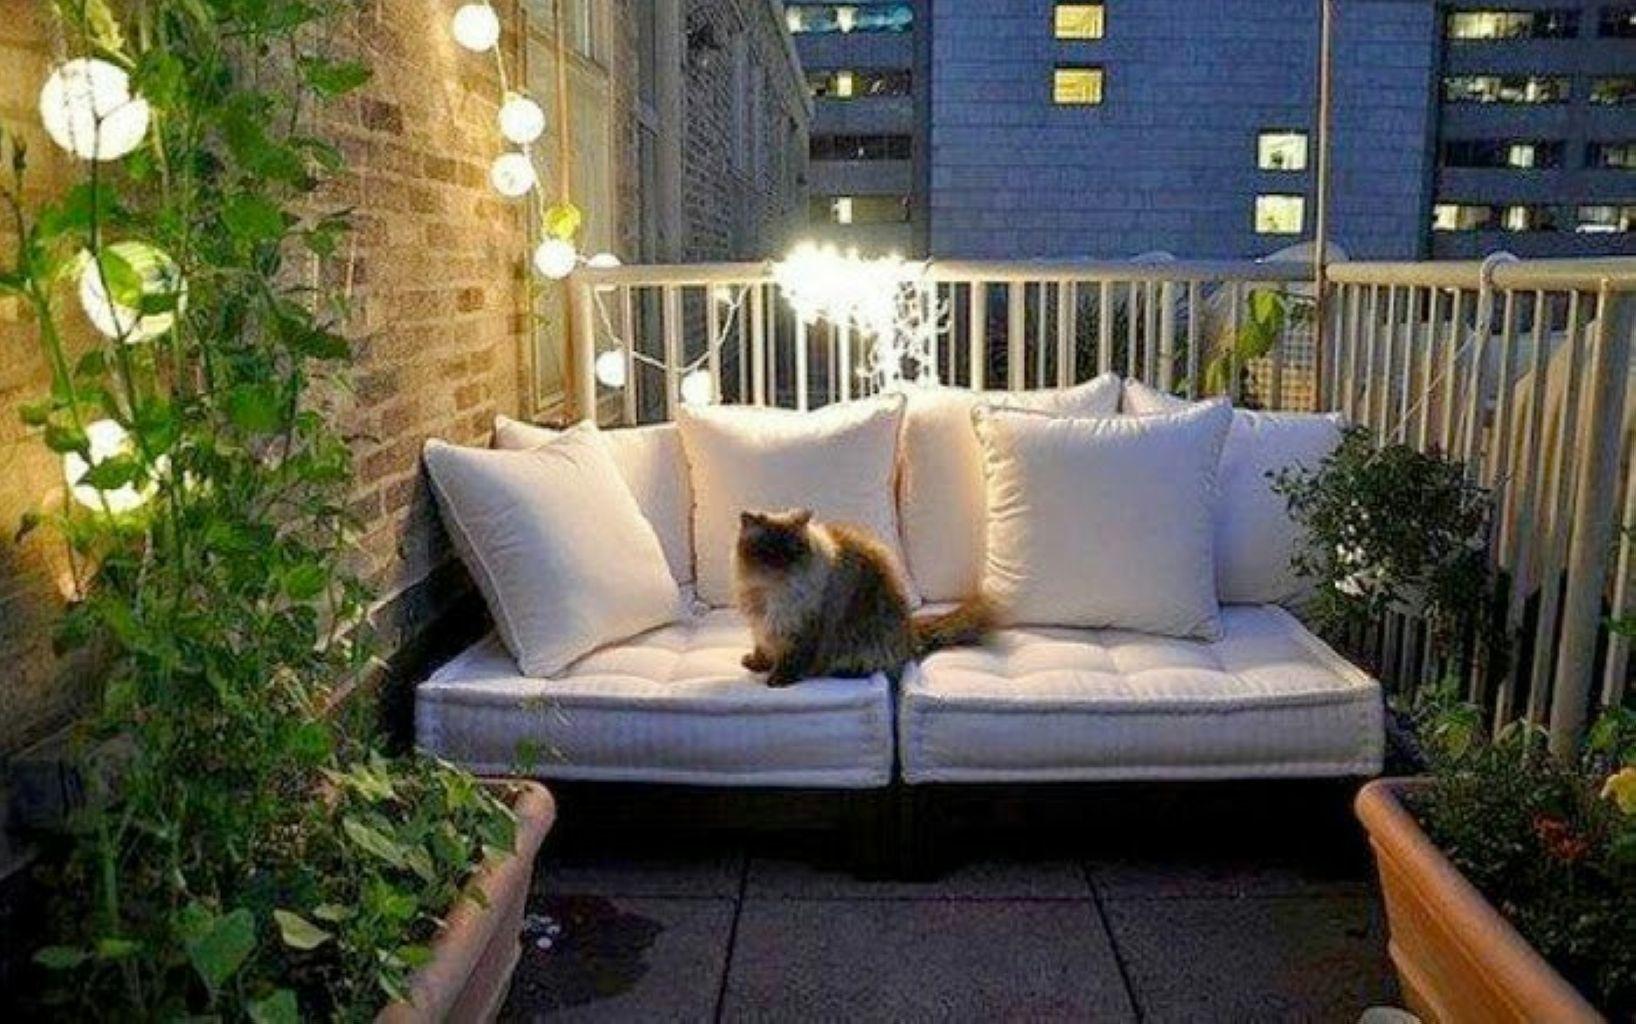 balcony lighting decorating ideas. 35 Cozy Small Apartment Balcony Ideas With Light Decoration Lighting Decorating I